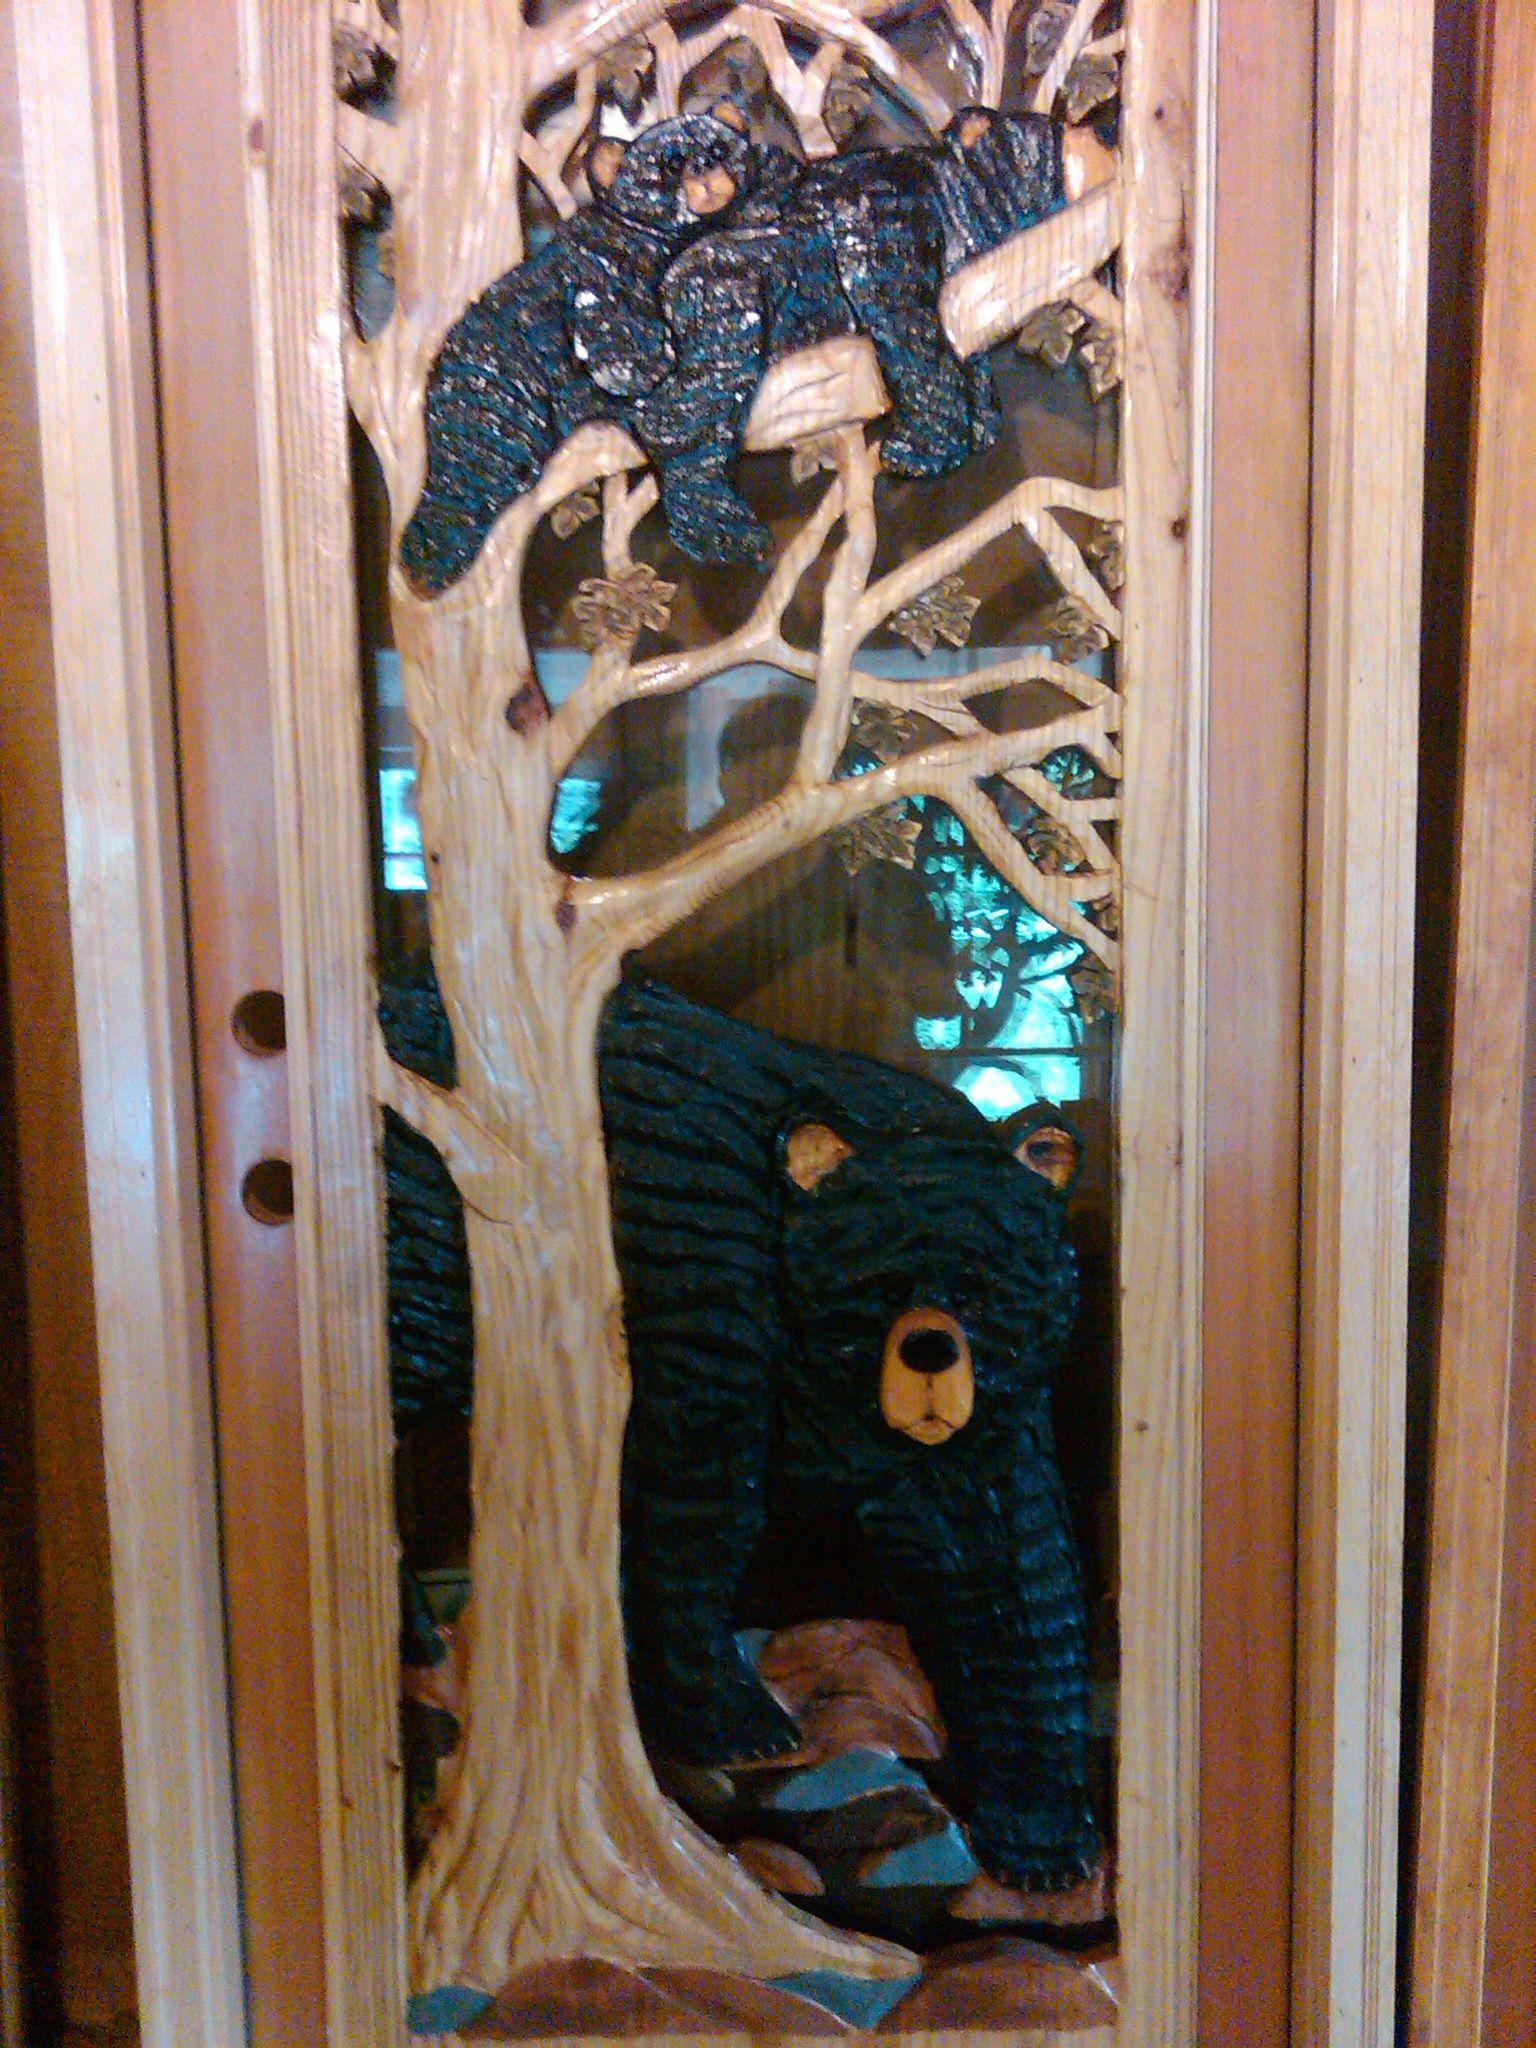 Chainsaw carved door panel artist name unknown pidgeon